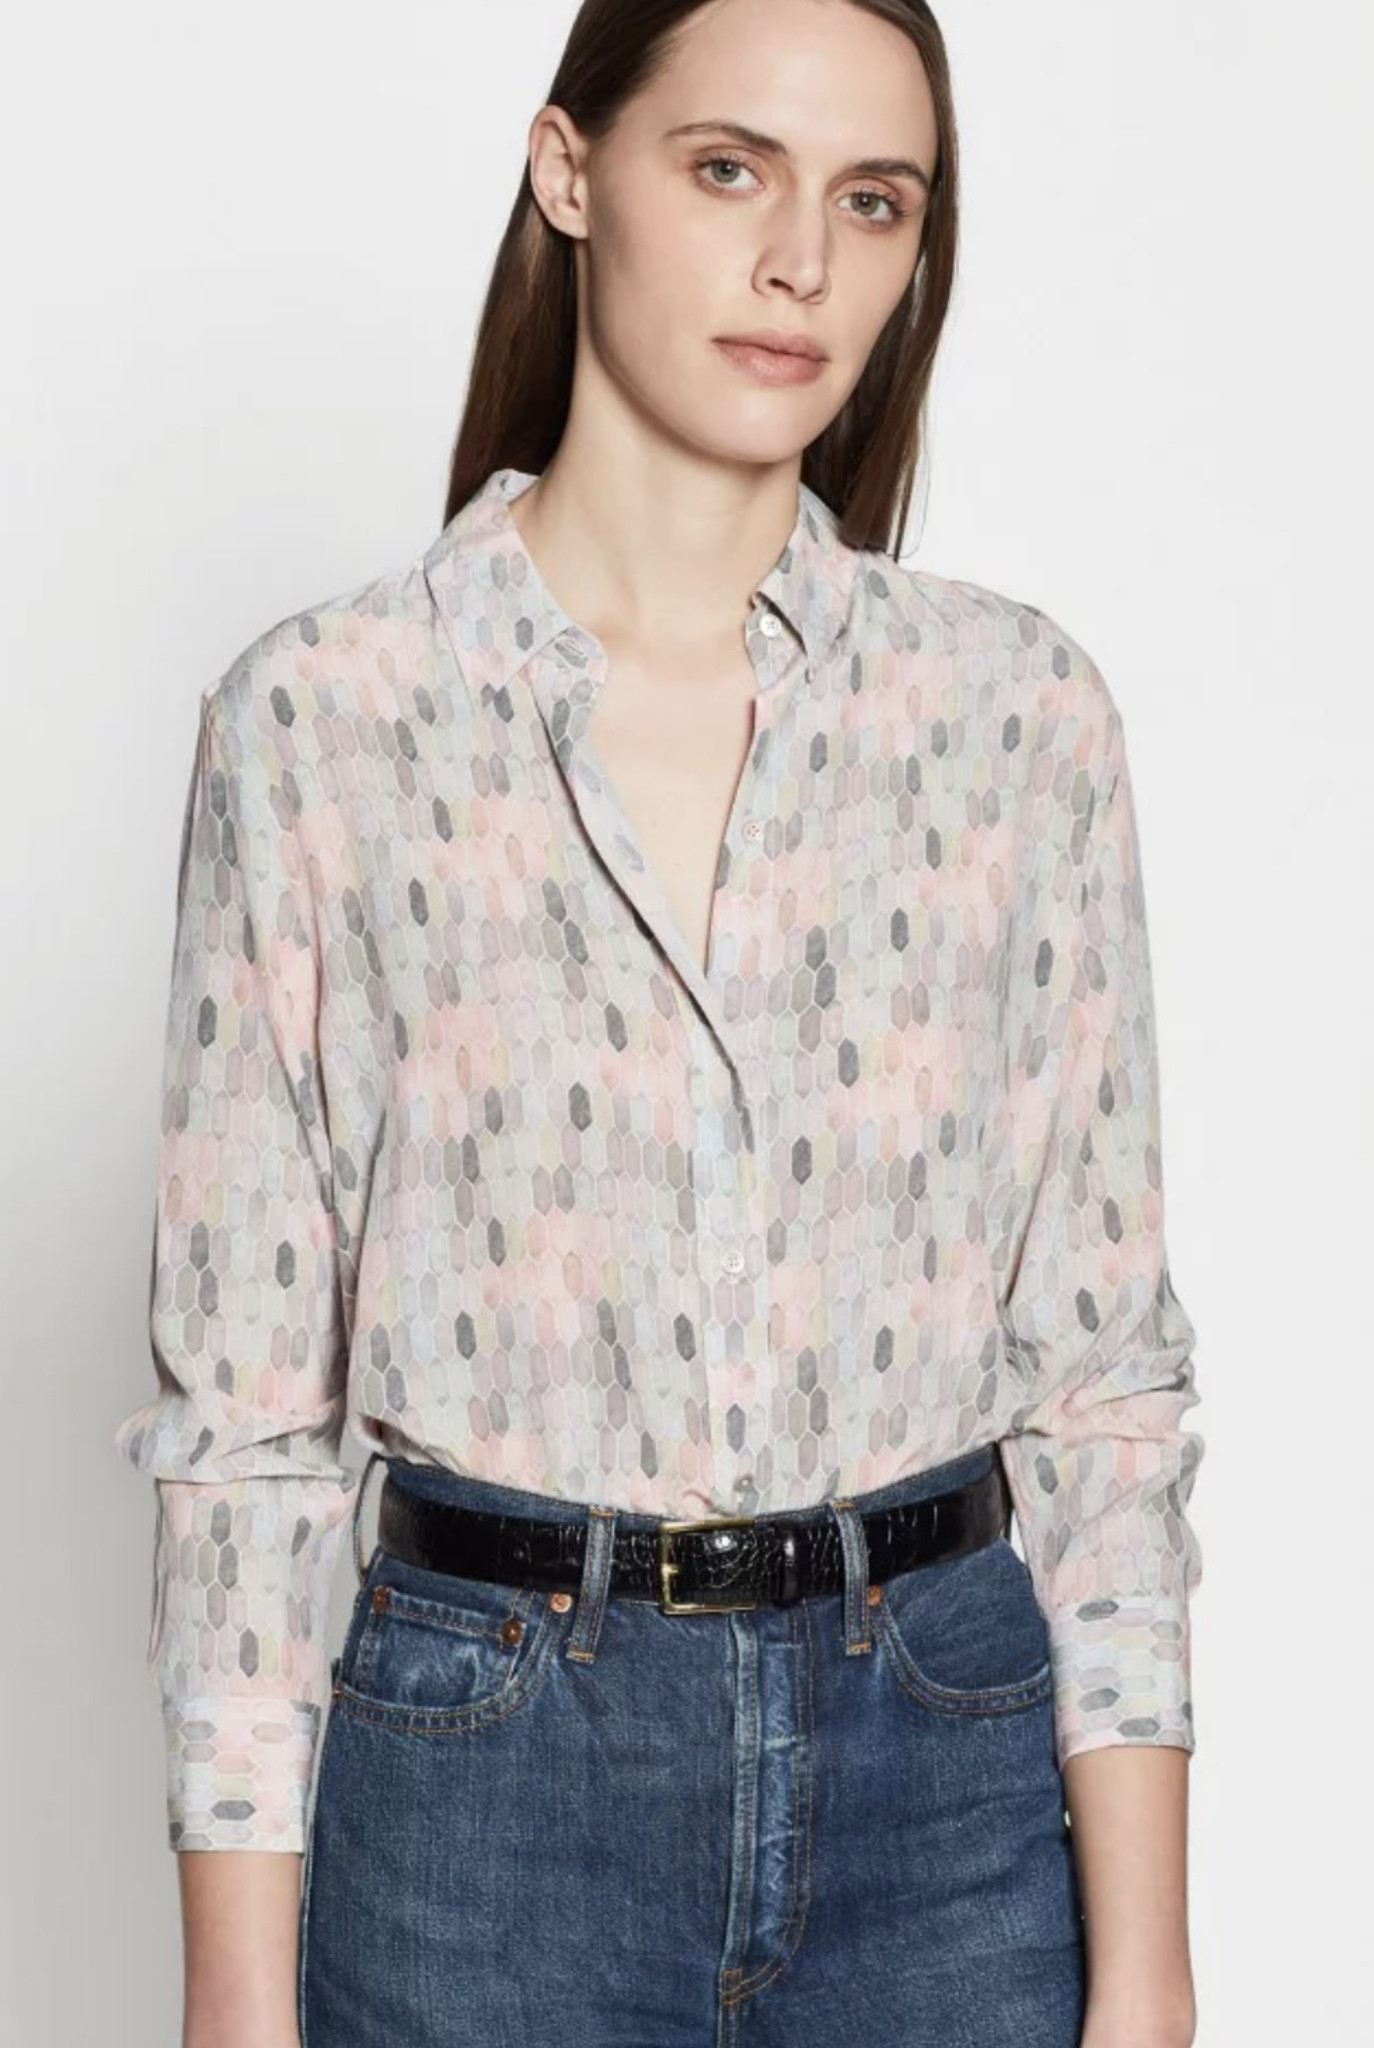 Daddy blouse Pink pastel